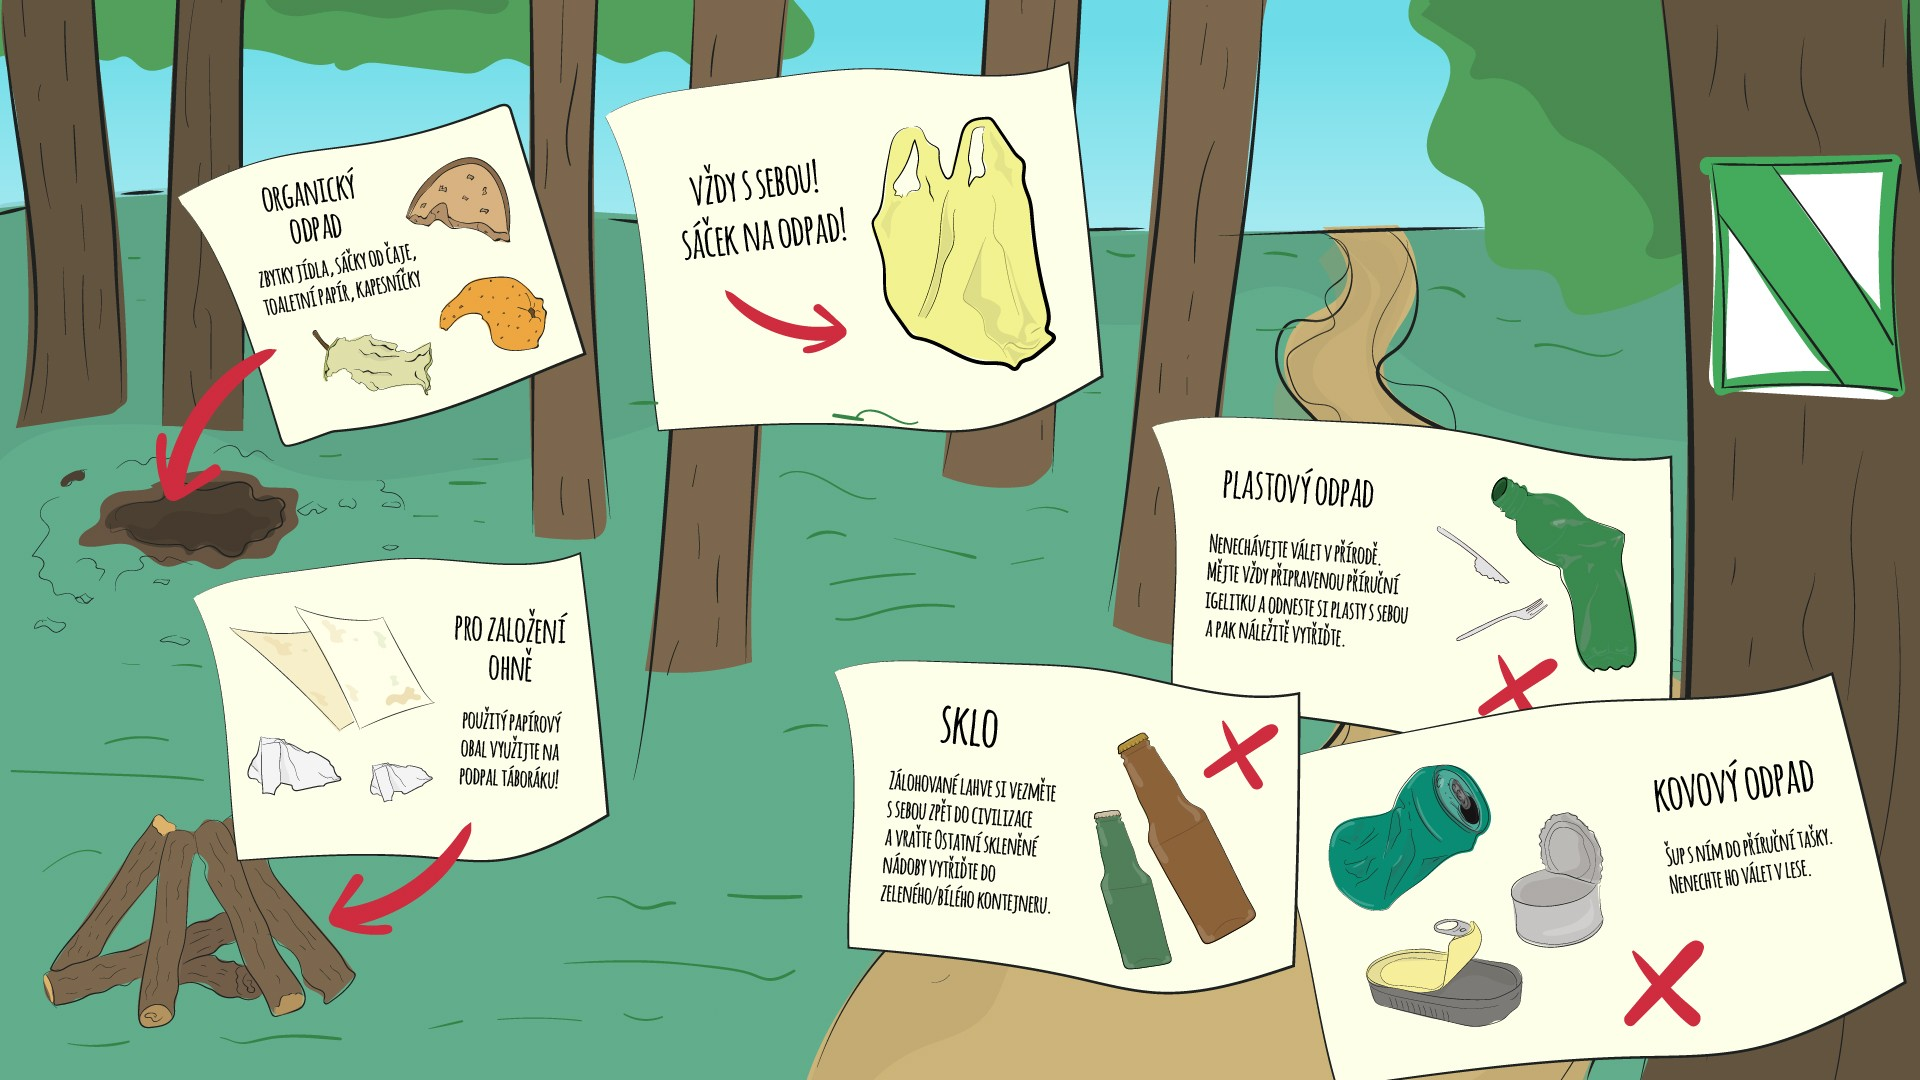 trideni_odpad_tura_turista_batoh_kov_sklo_plast_papir_plechovka_konzerva_lahev_sacek_taska_bioodpad